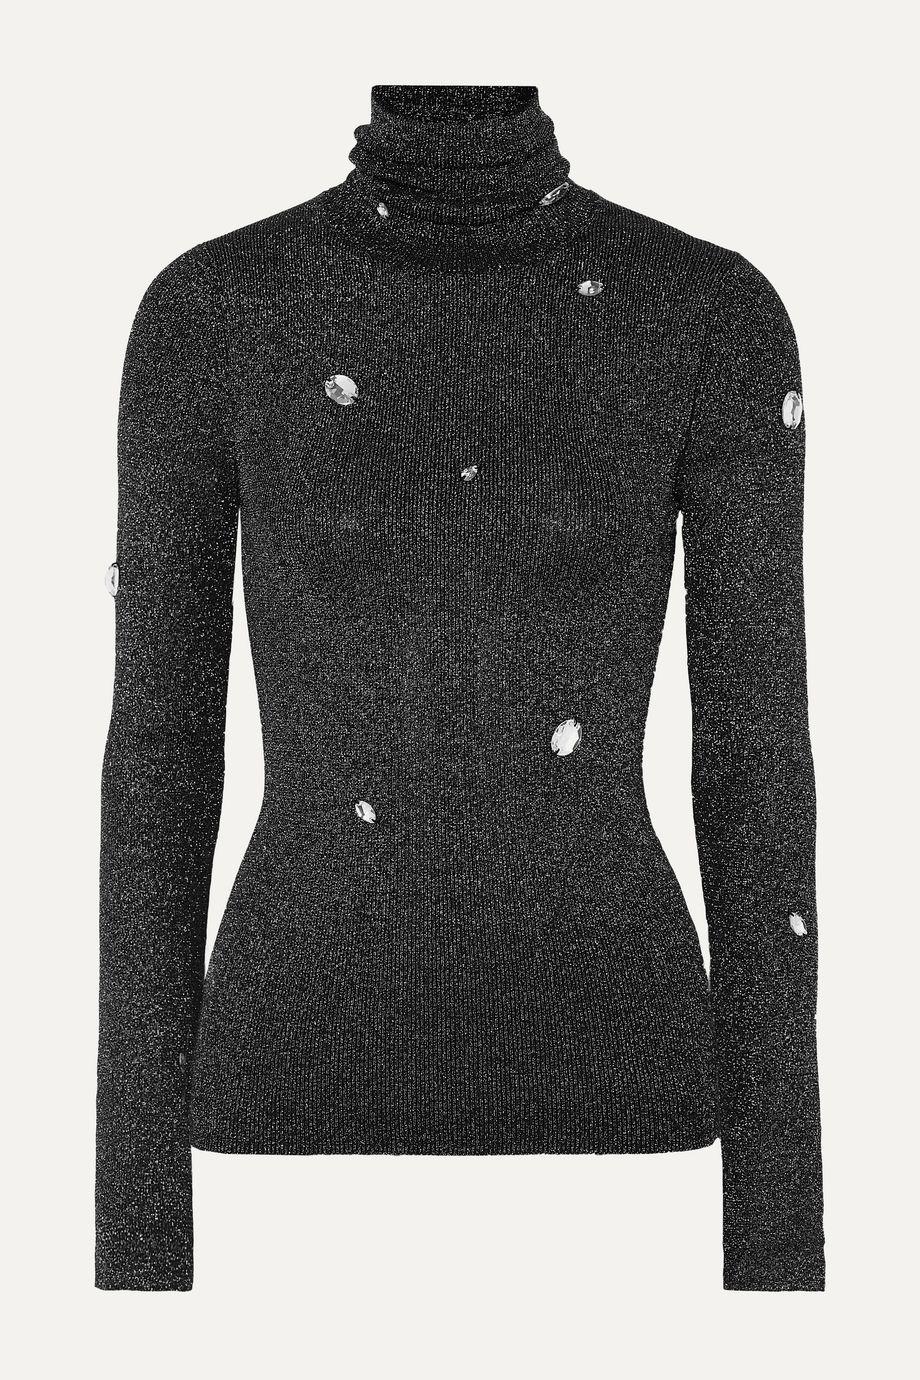 Christopher Kane Crystal-embellished metallic ribbed-knit turtleneck sweater